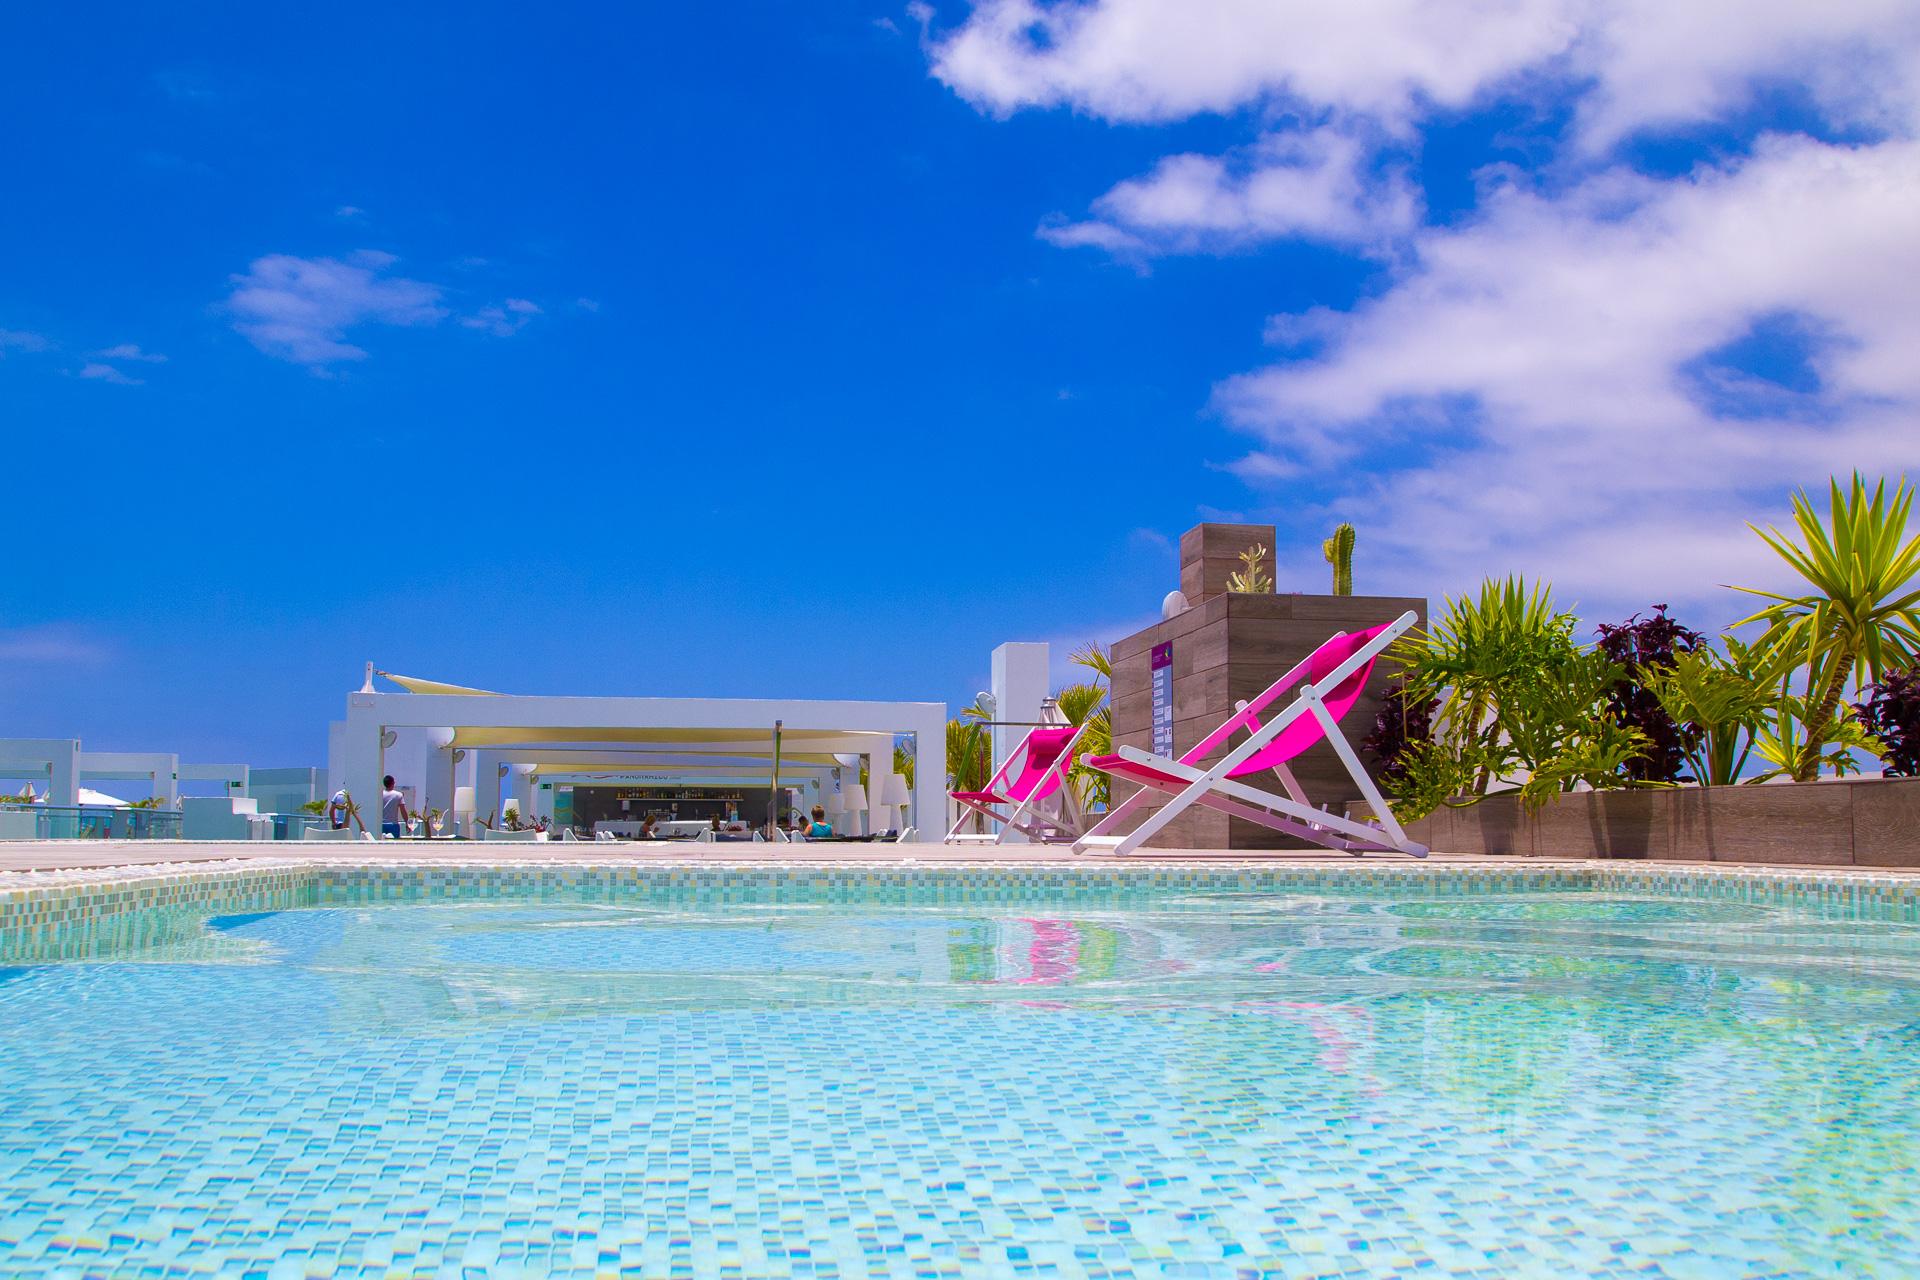 Resort/Hotel photography